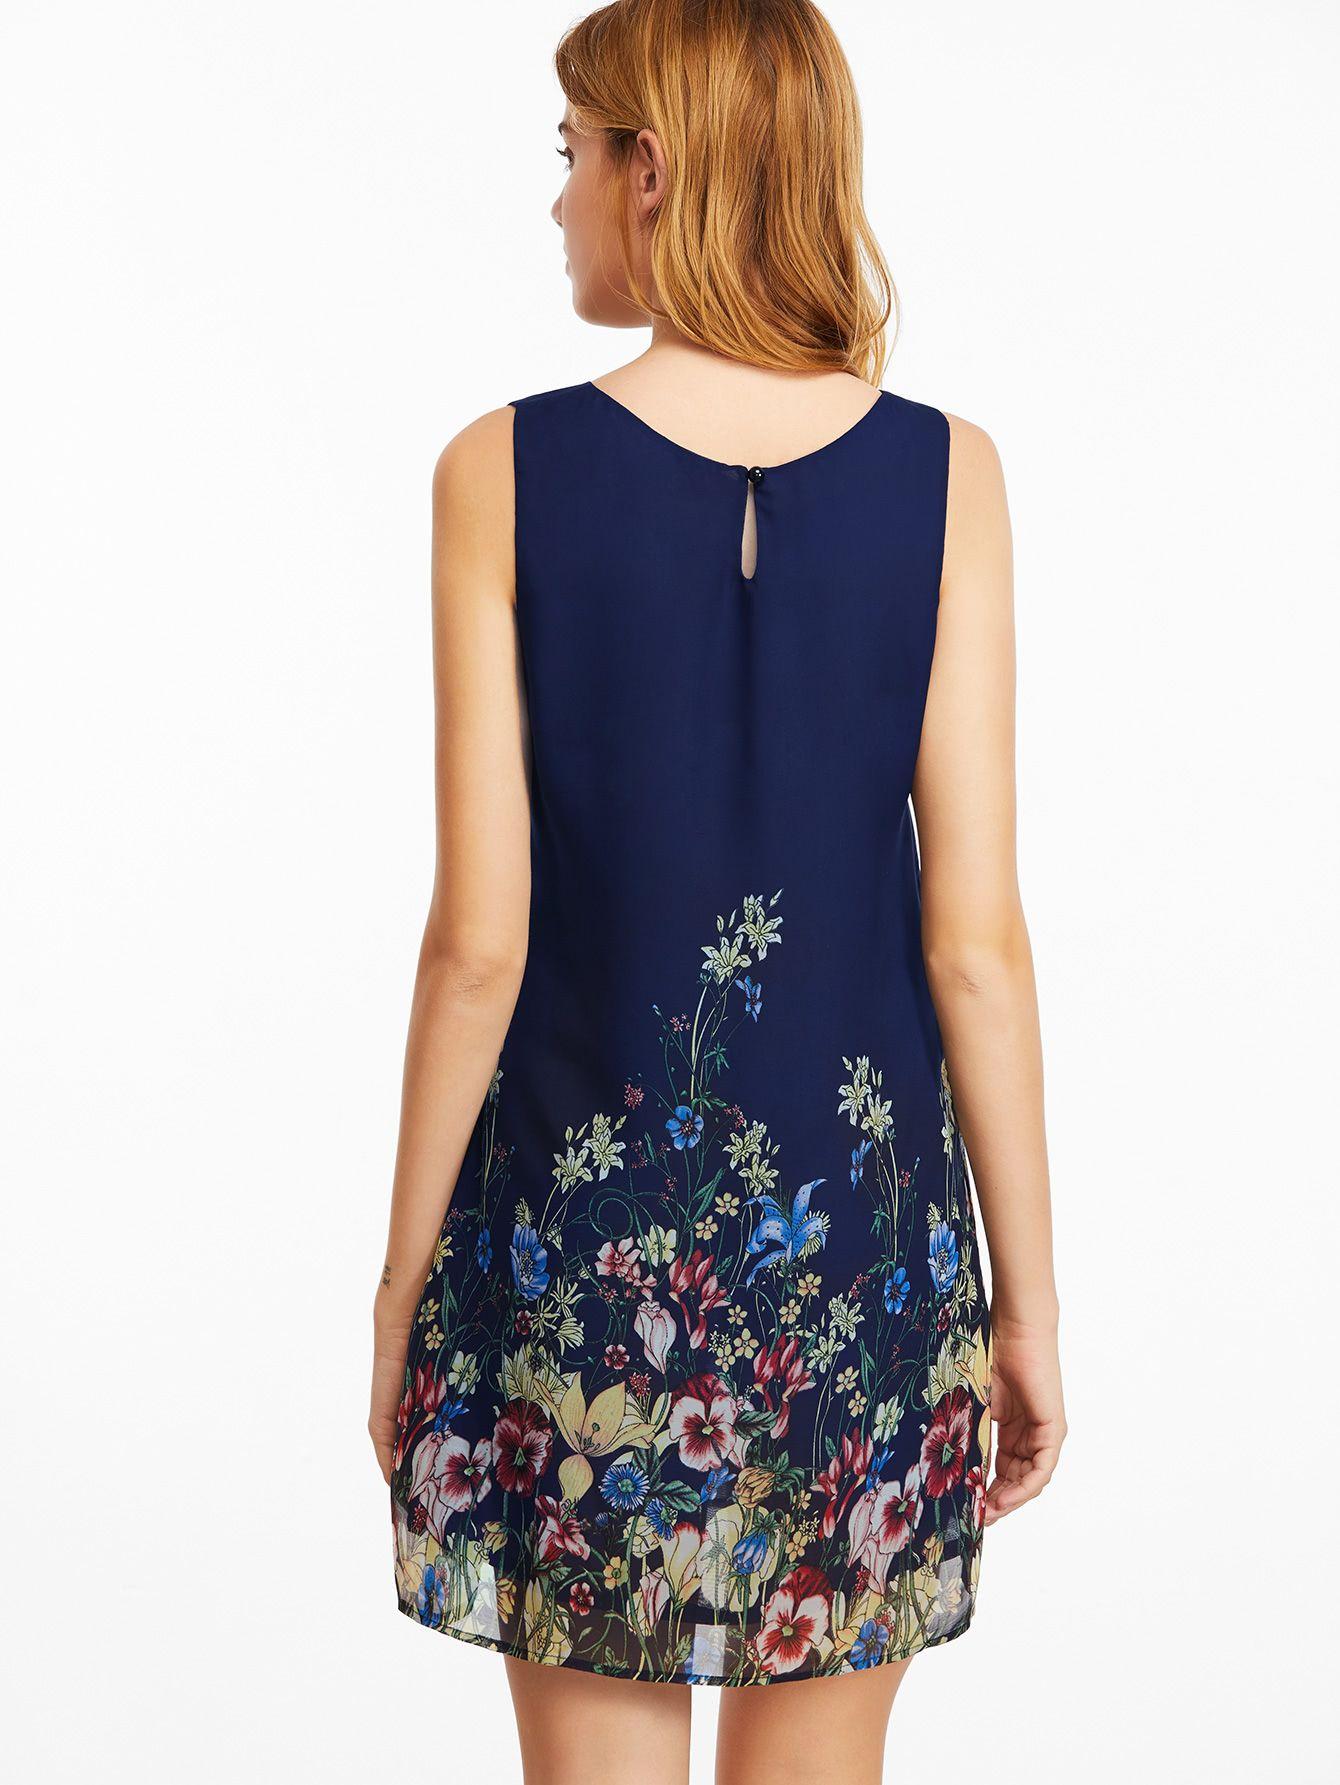 Vestido Sin Mangas Con Estampado Floral Azul Marino Spanish Shein Sheinside Sifon Elbise Elbise Modelleri Elbise